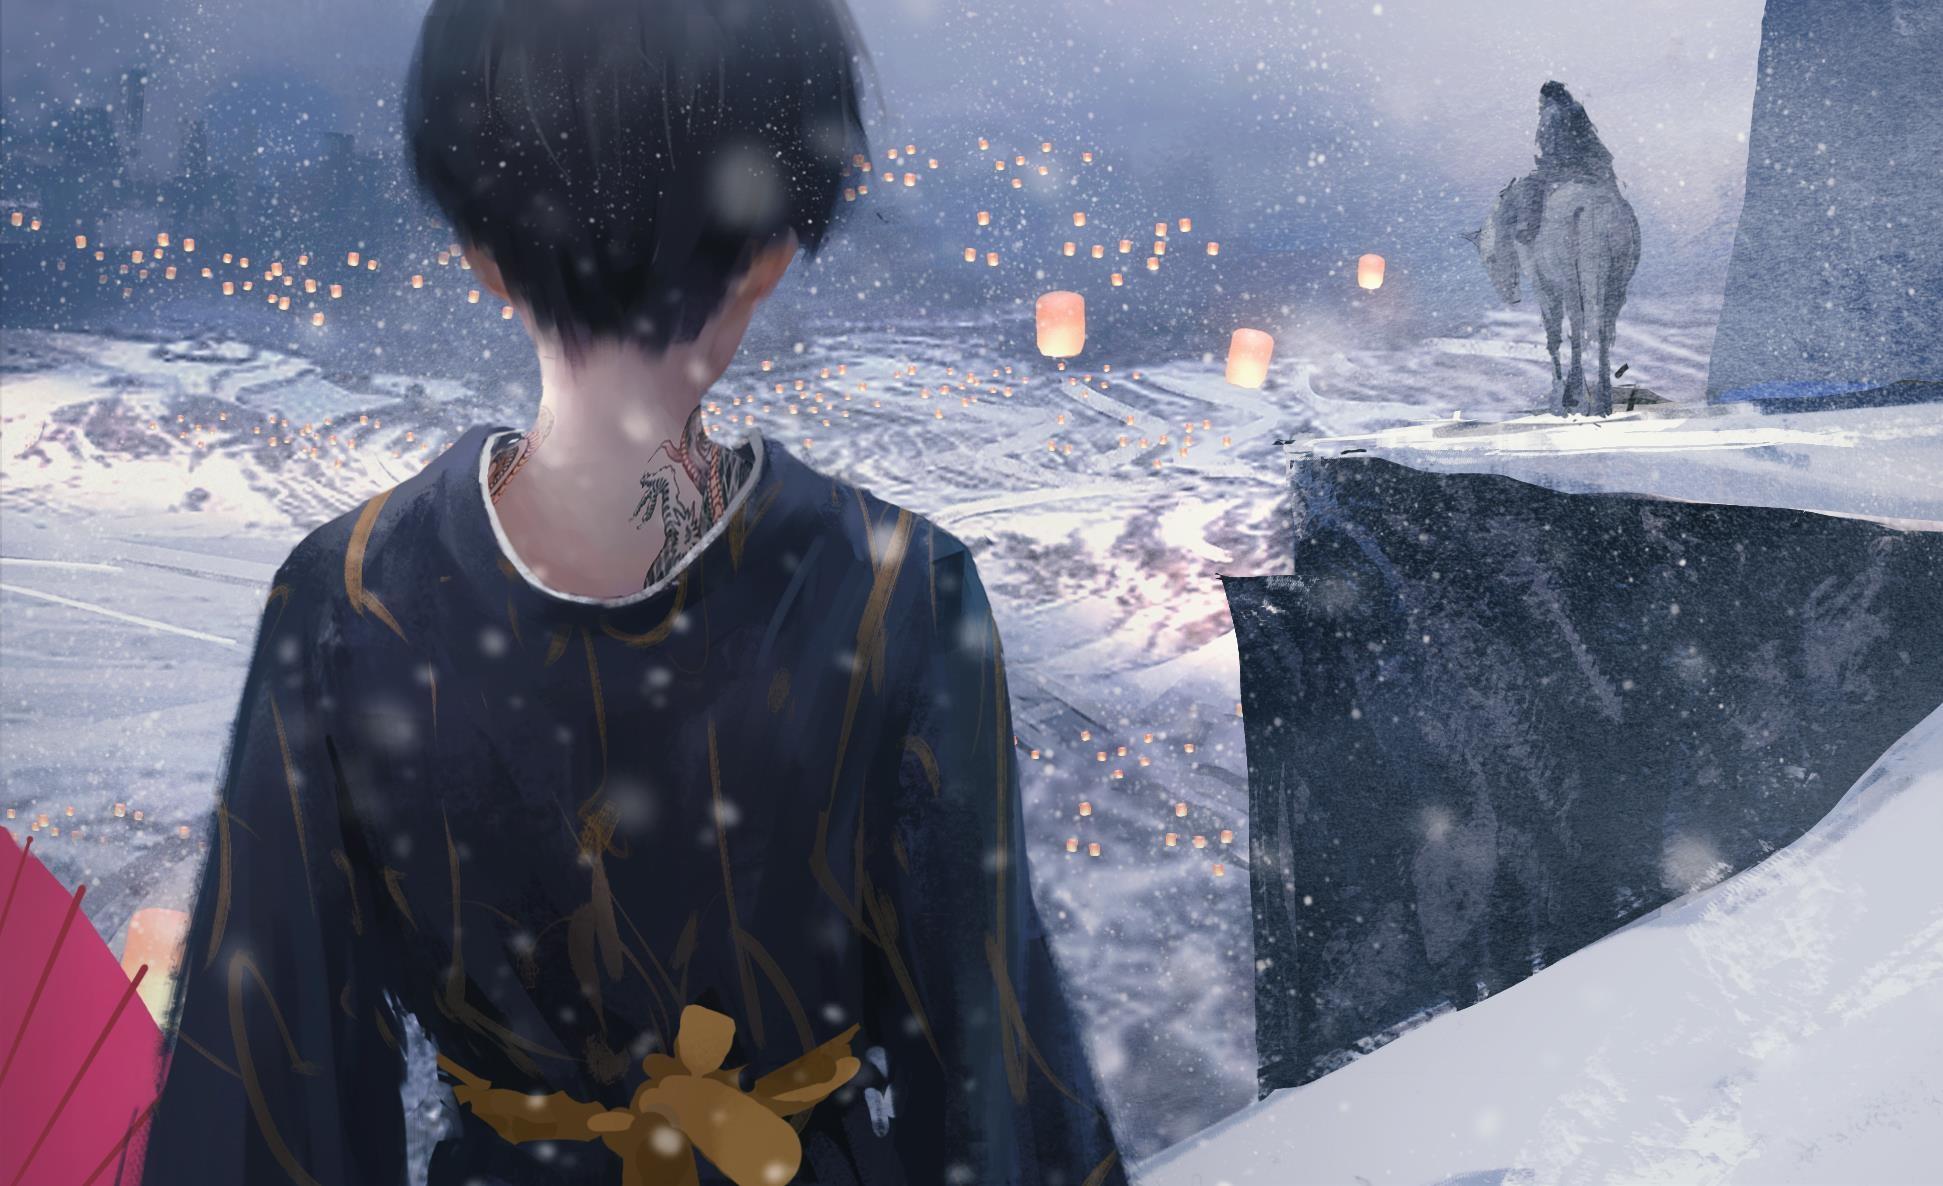 Download Sad Girl In Snow Wallpaper Wlop Oiginal Girl Woman Beautiful Fantasy Art Tattoo